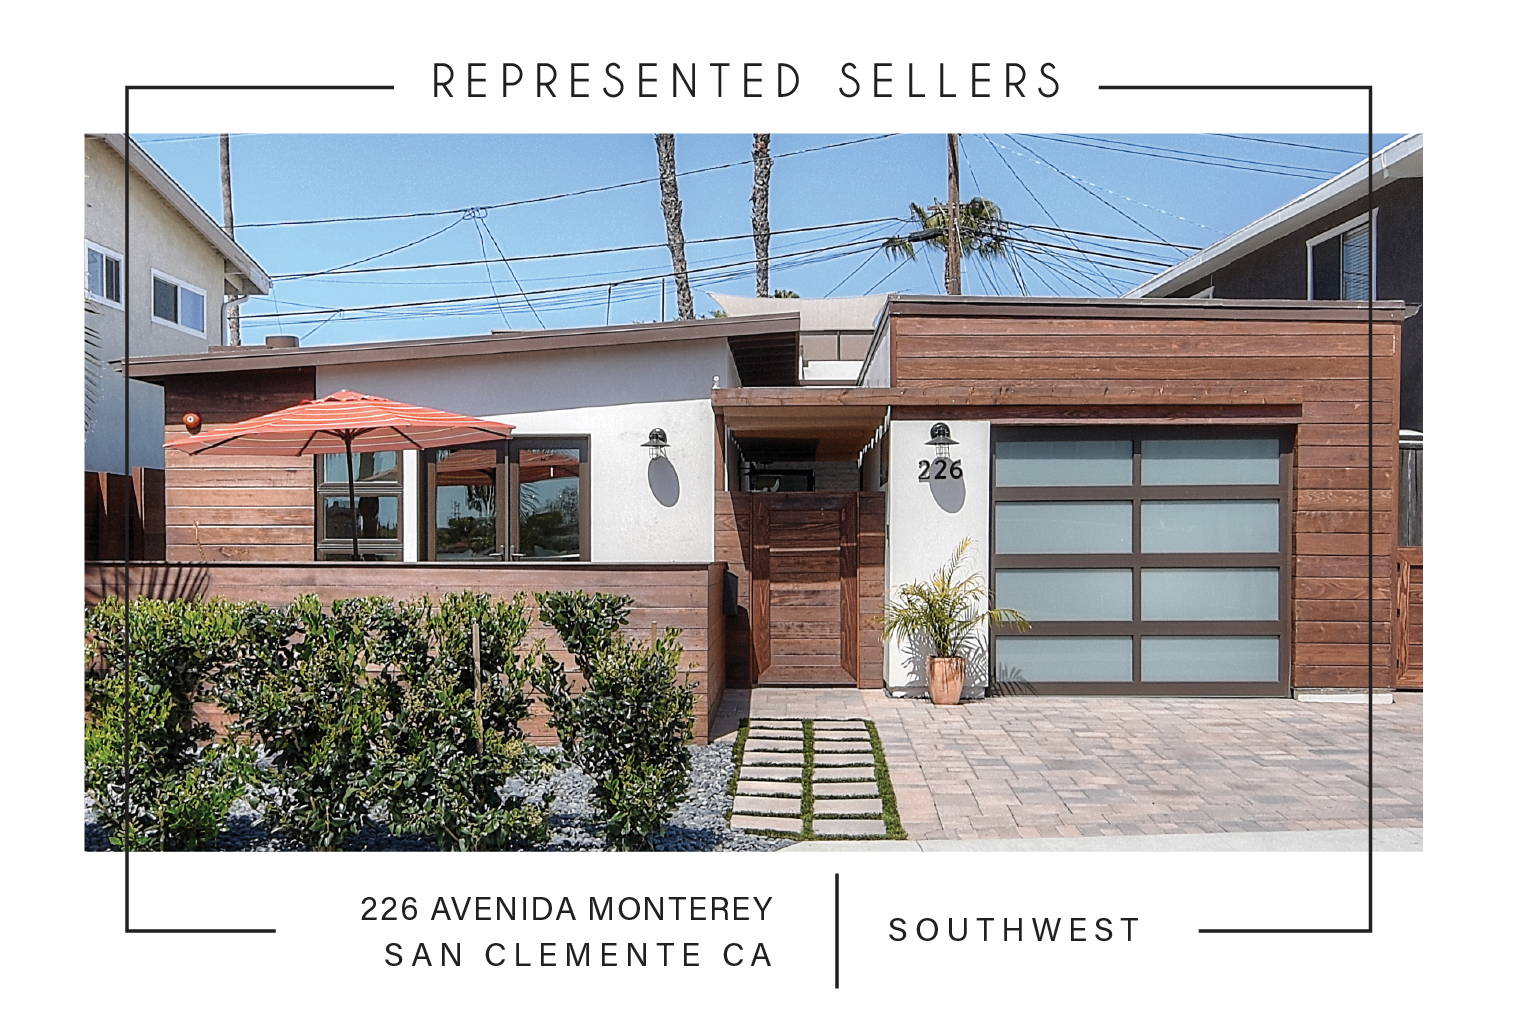 SOLD 8/09/2017    $1,350,000   226 AVenida Monterey SAN CLEMENTE CA